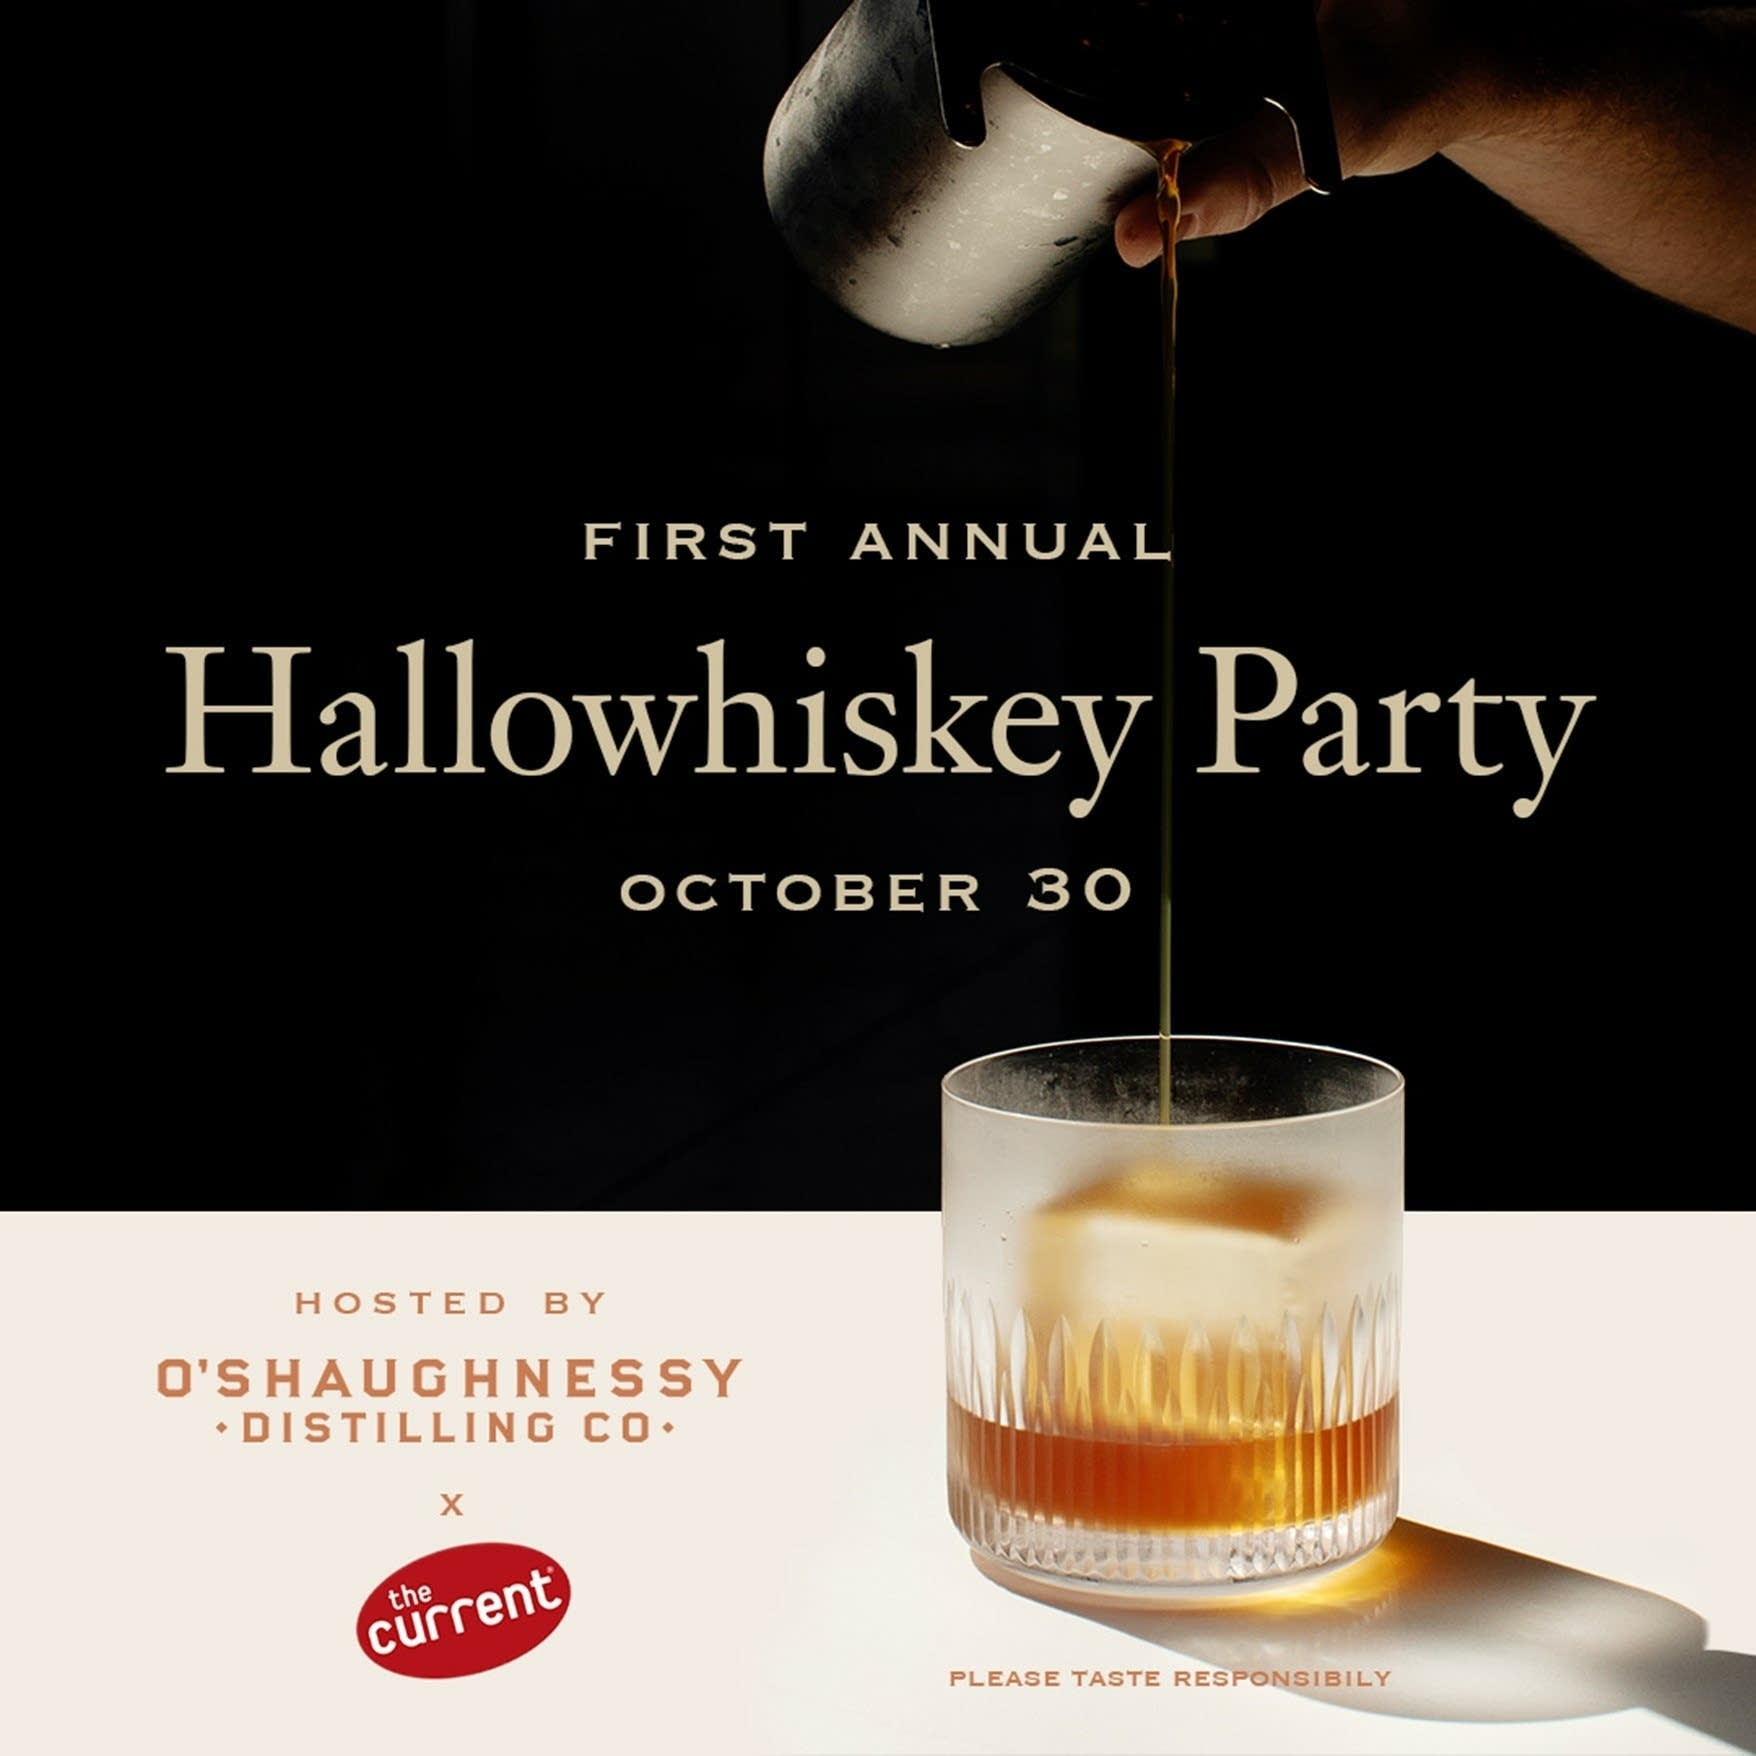 Hallowhiskey